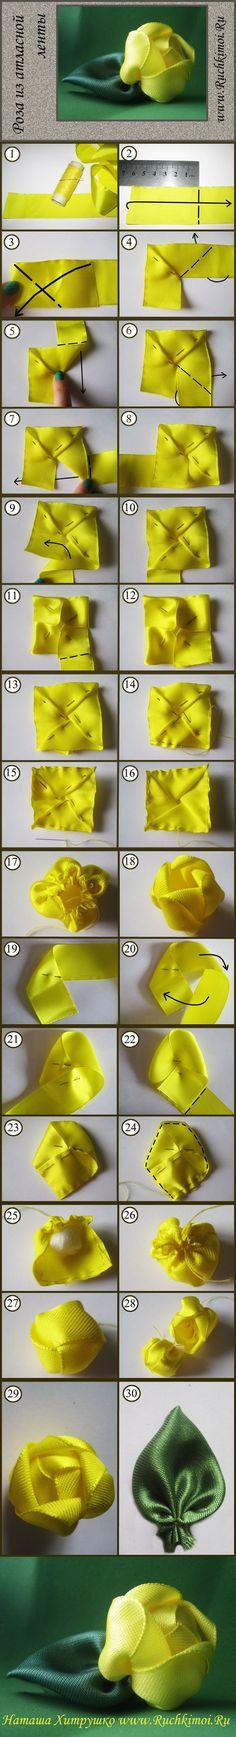 New Pics ruybang Ribbon Flower Strategies I really could very easily include entitled this specific posting tactics to produce bow flow Ribbon Art, Diy Ribbon, Fabric Ribbon, Ribbon Crafts, Flower Crafts, Ribbon Bows, Fabric Crafts, Sewing Crafts, Ribbons